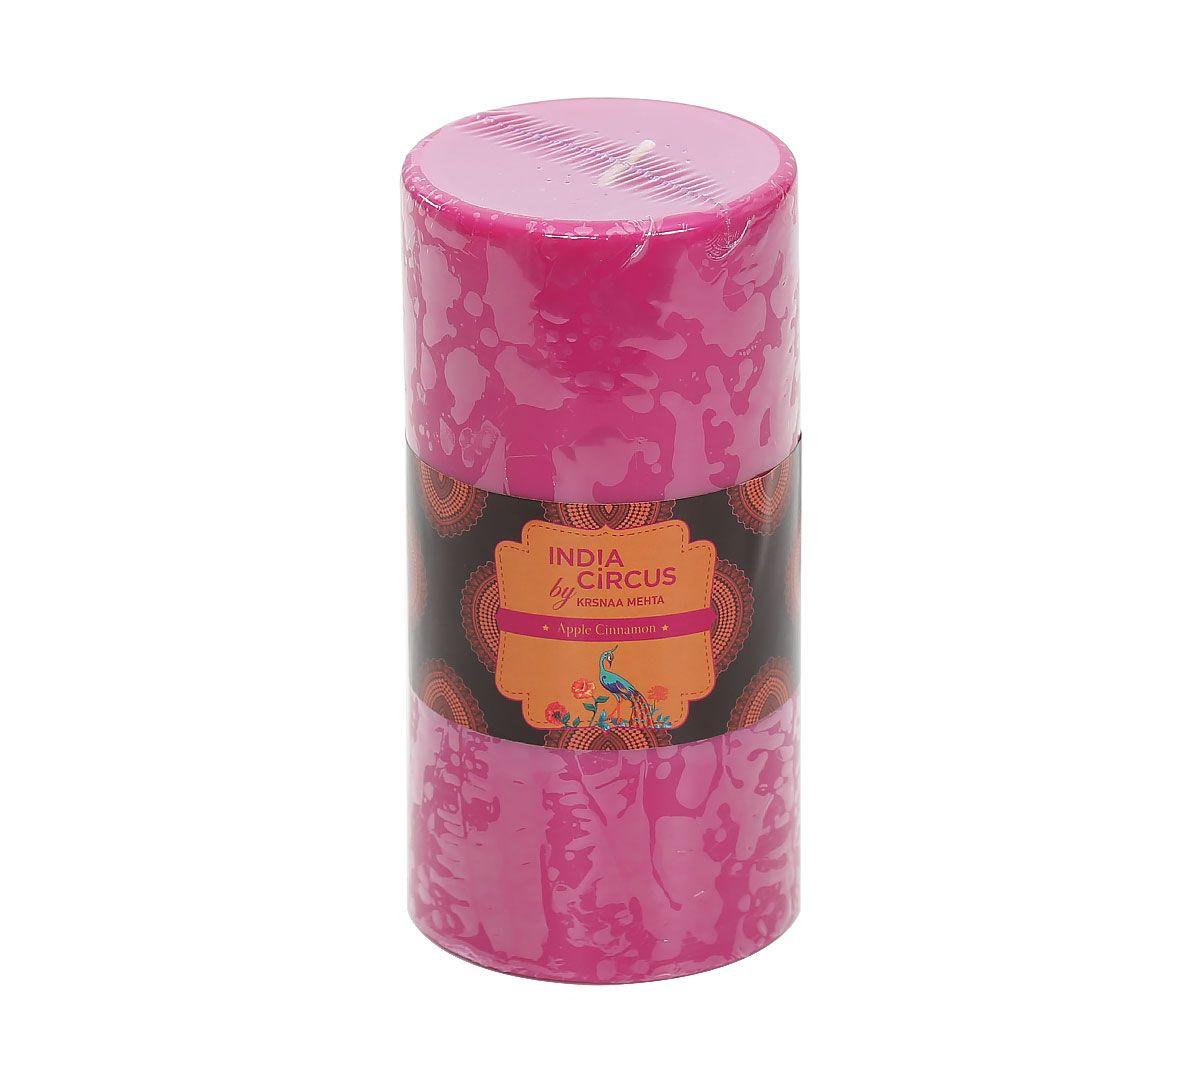 India Circus Apple Cinnamon Pillar Candle